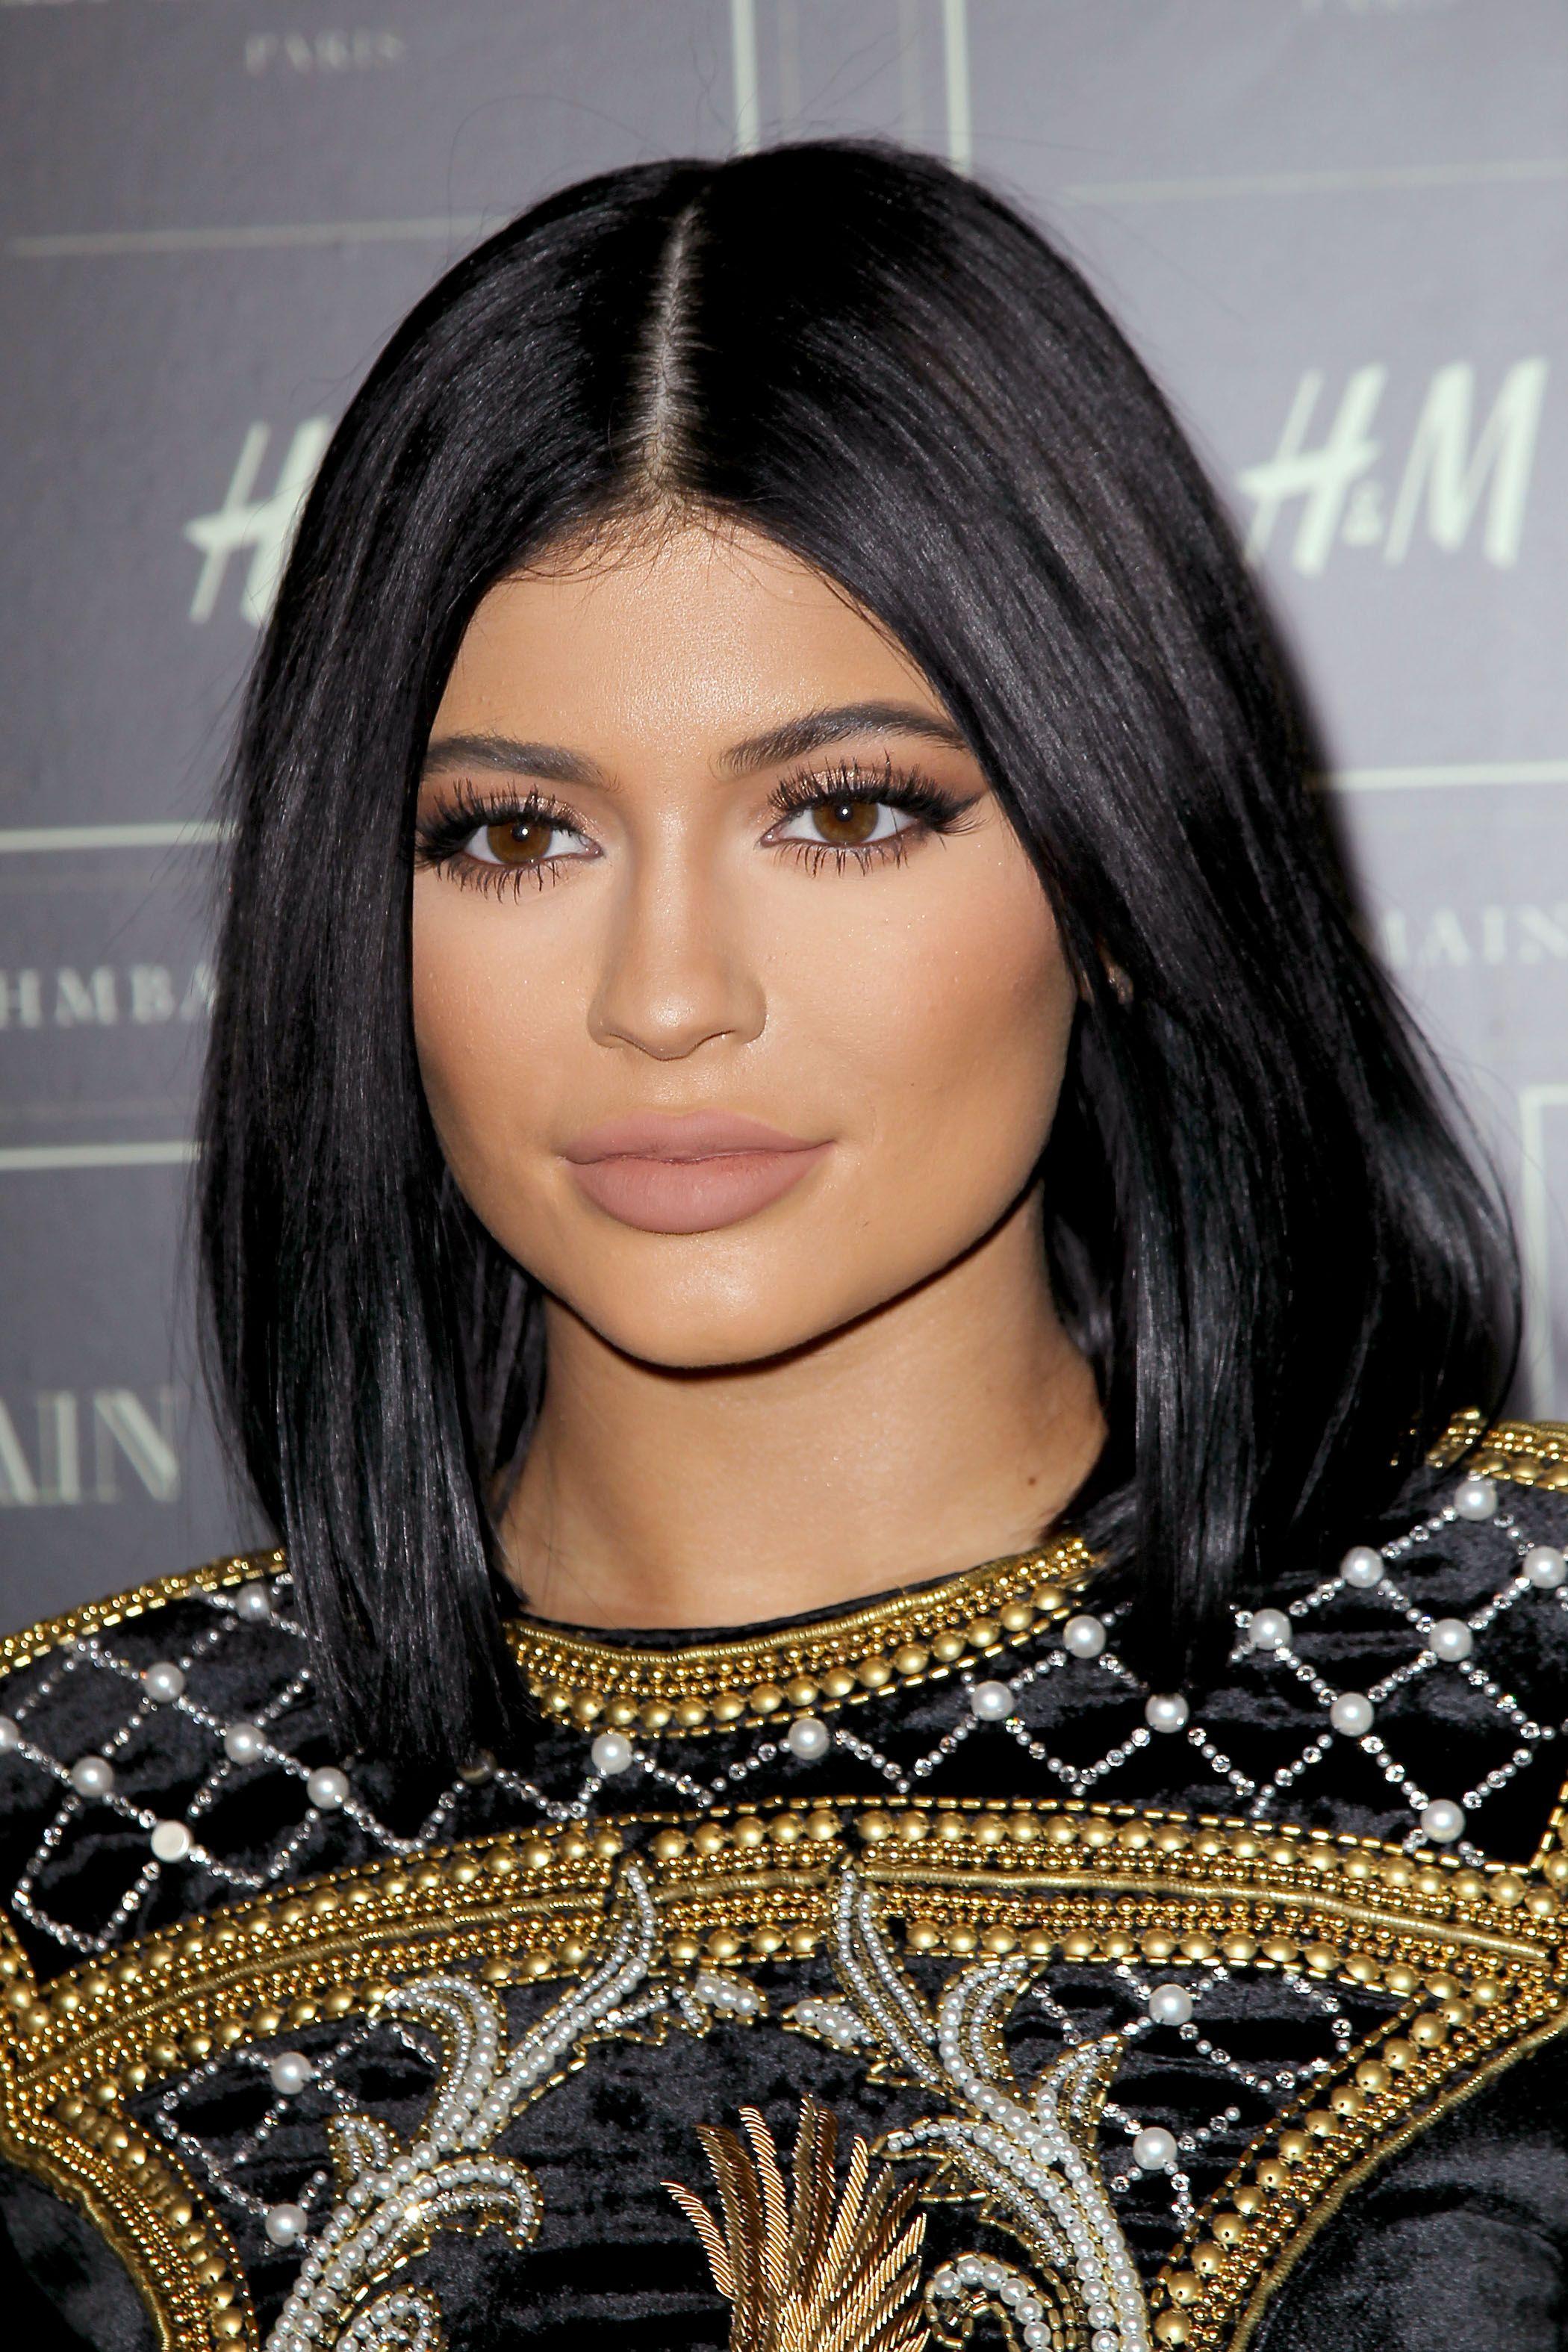 Kylie Jenner JPG Makeup Pinterest